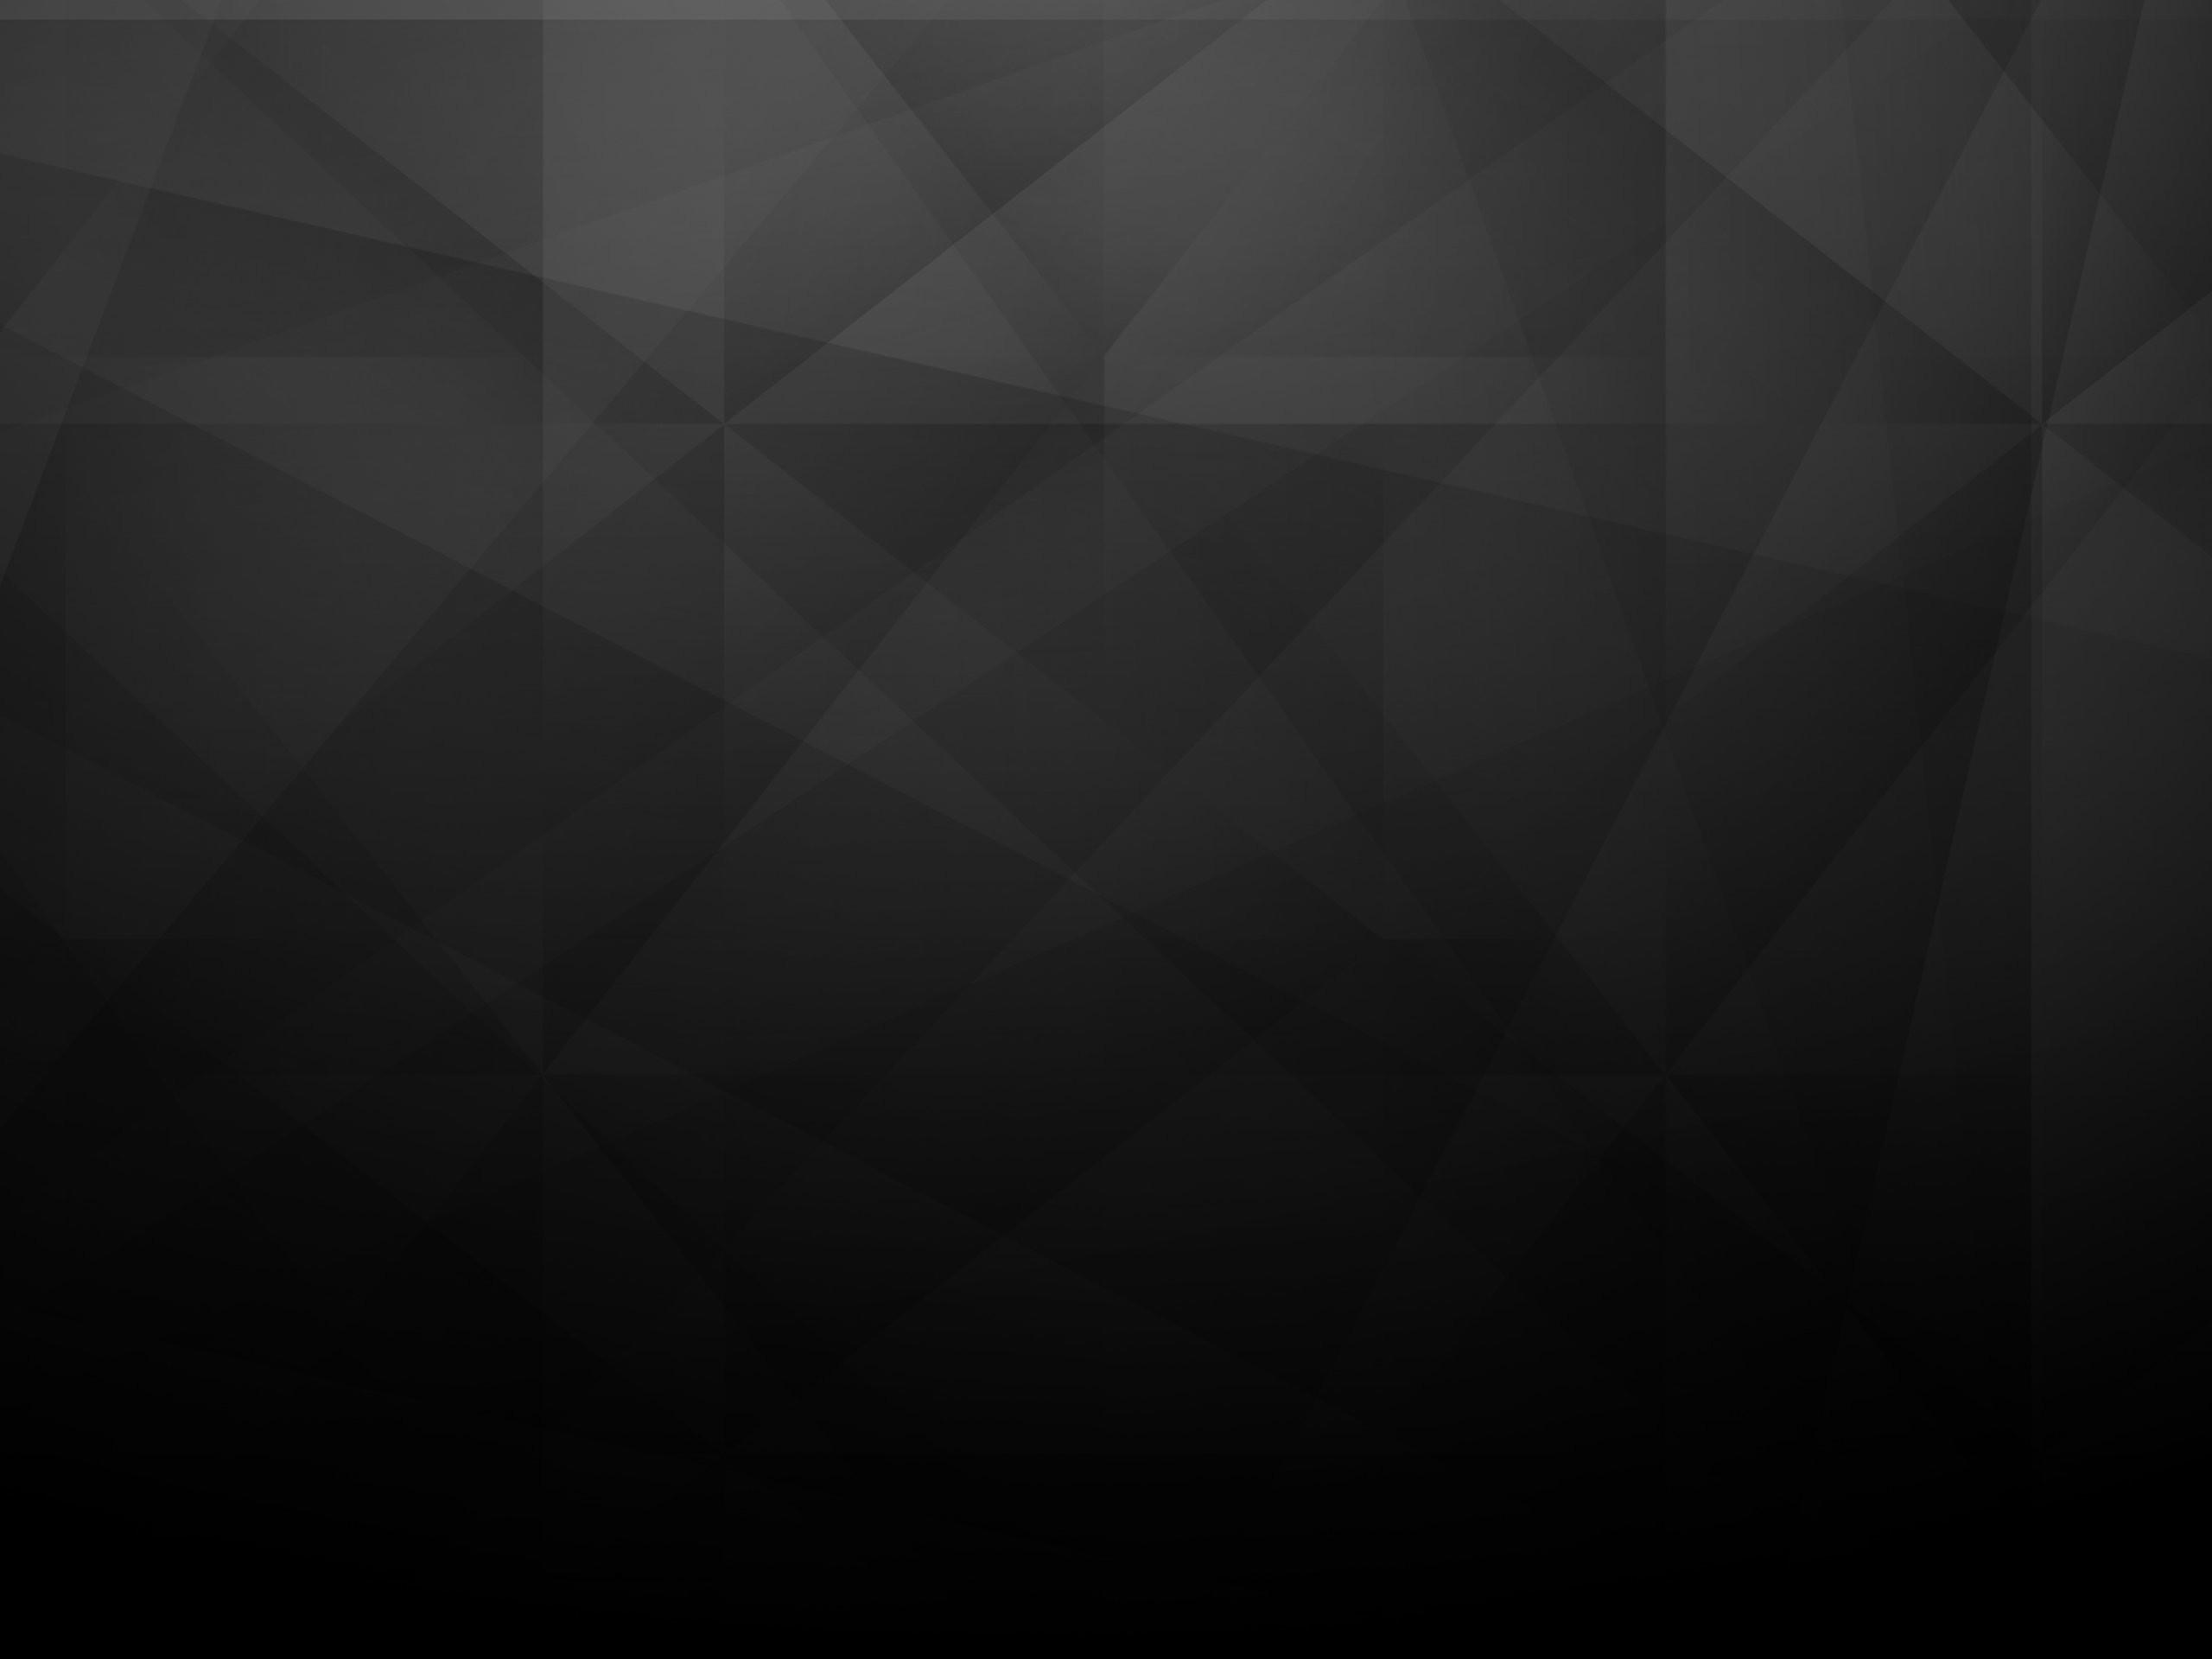 black wallpaper 1 black wallpaper 2 black wallpaper 3 …